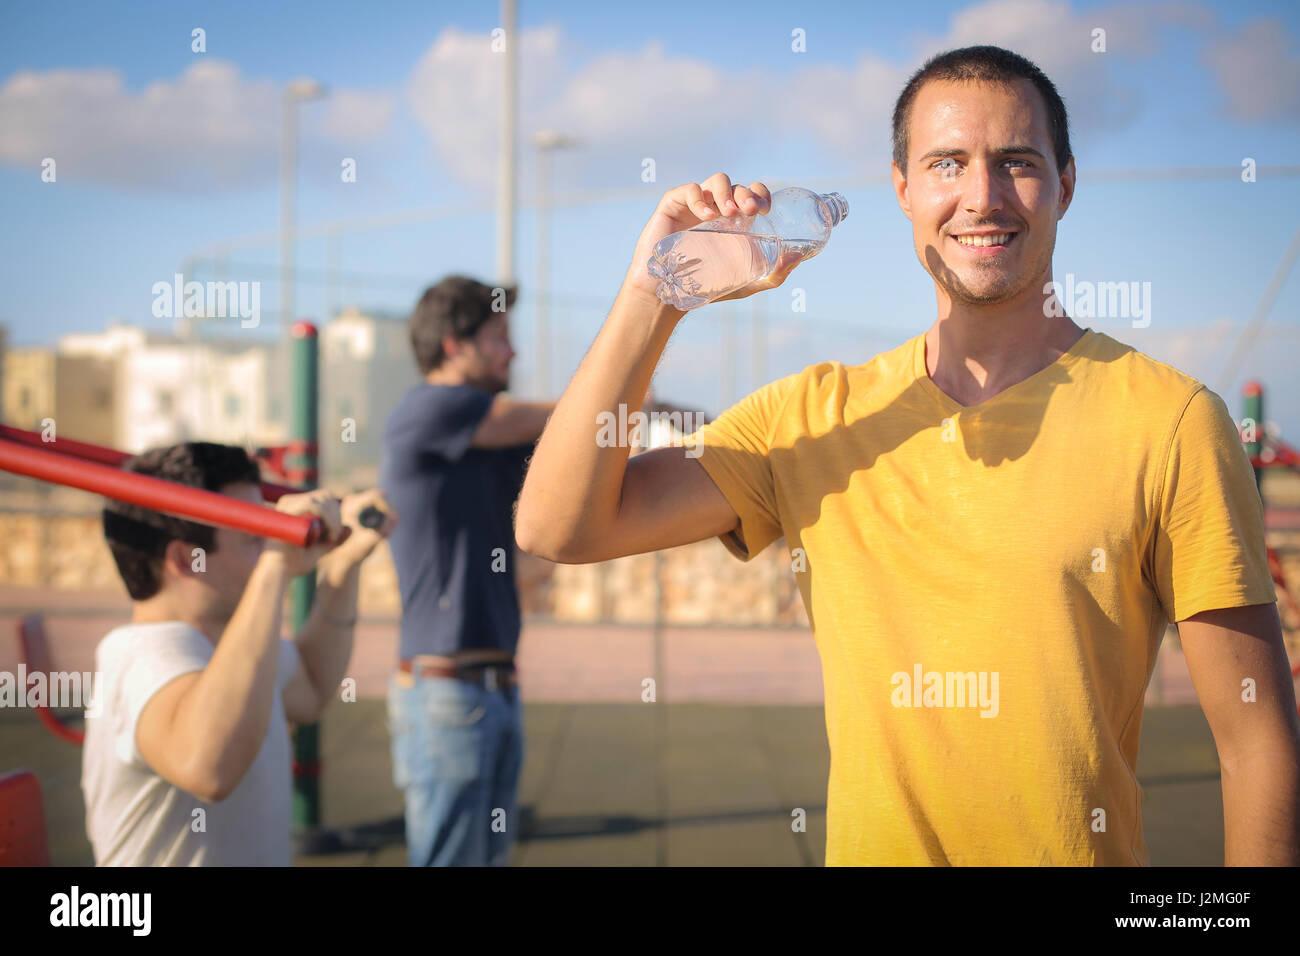 3 men street workouting and drinking water - Stock Image